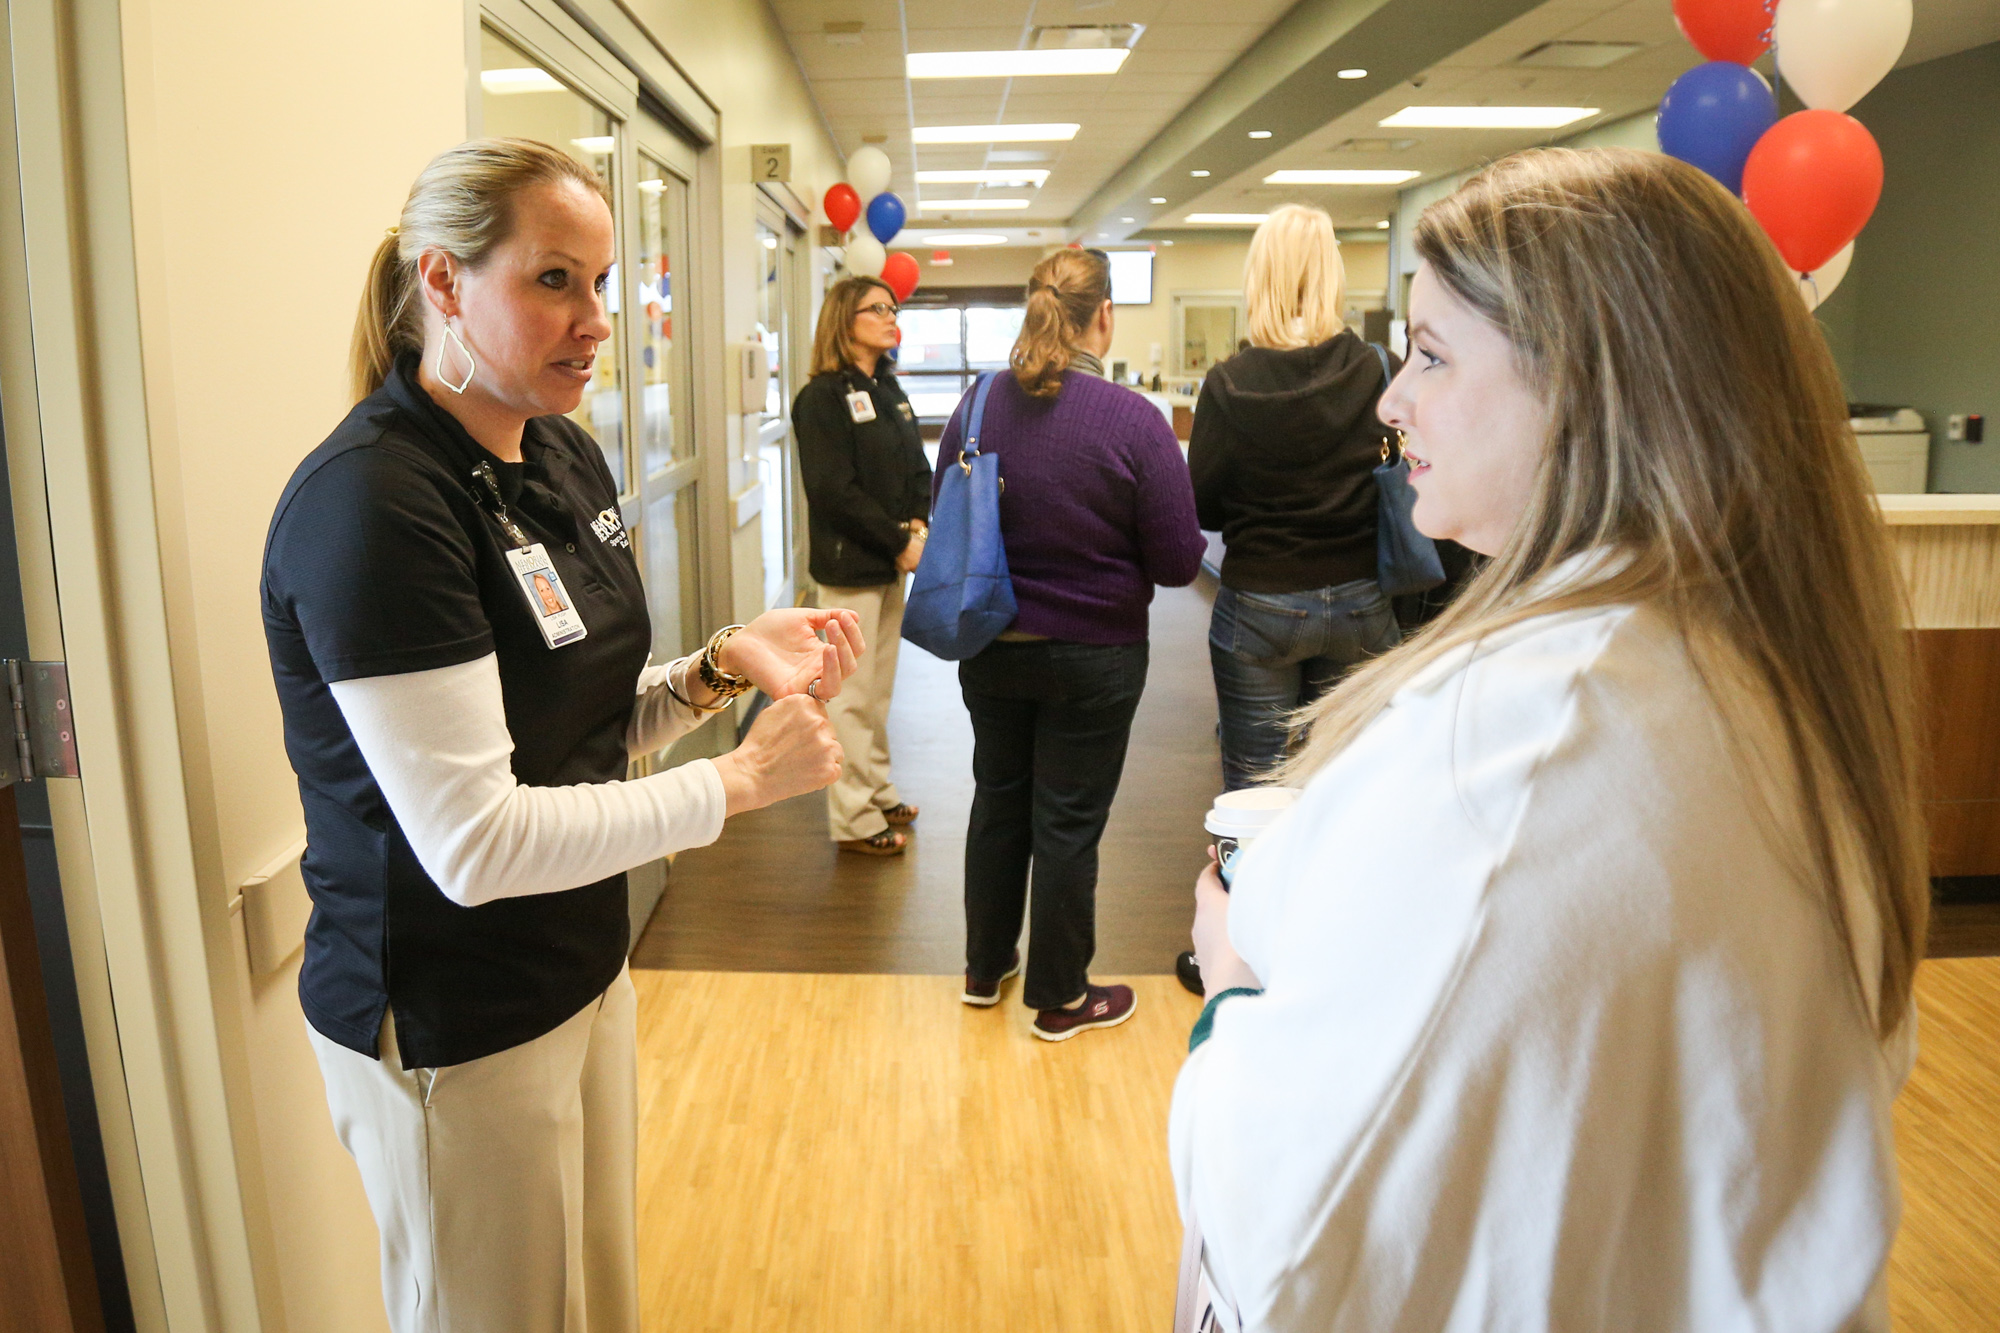 New Memorial Hermann Convenient Care Center offers ER